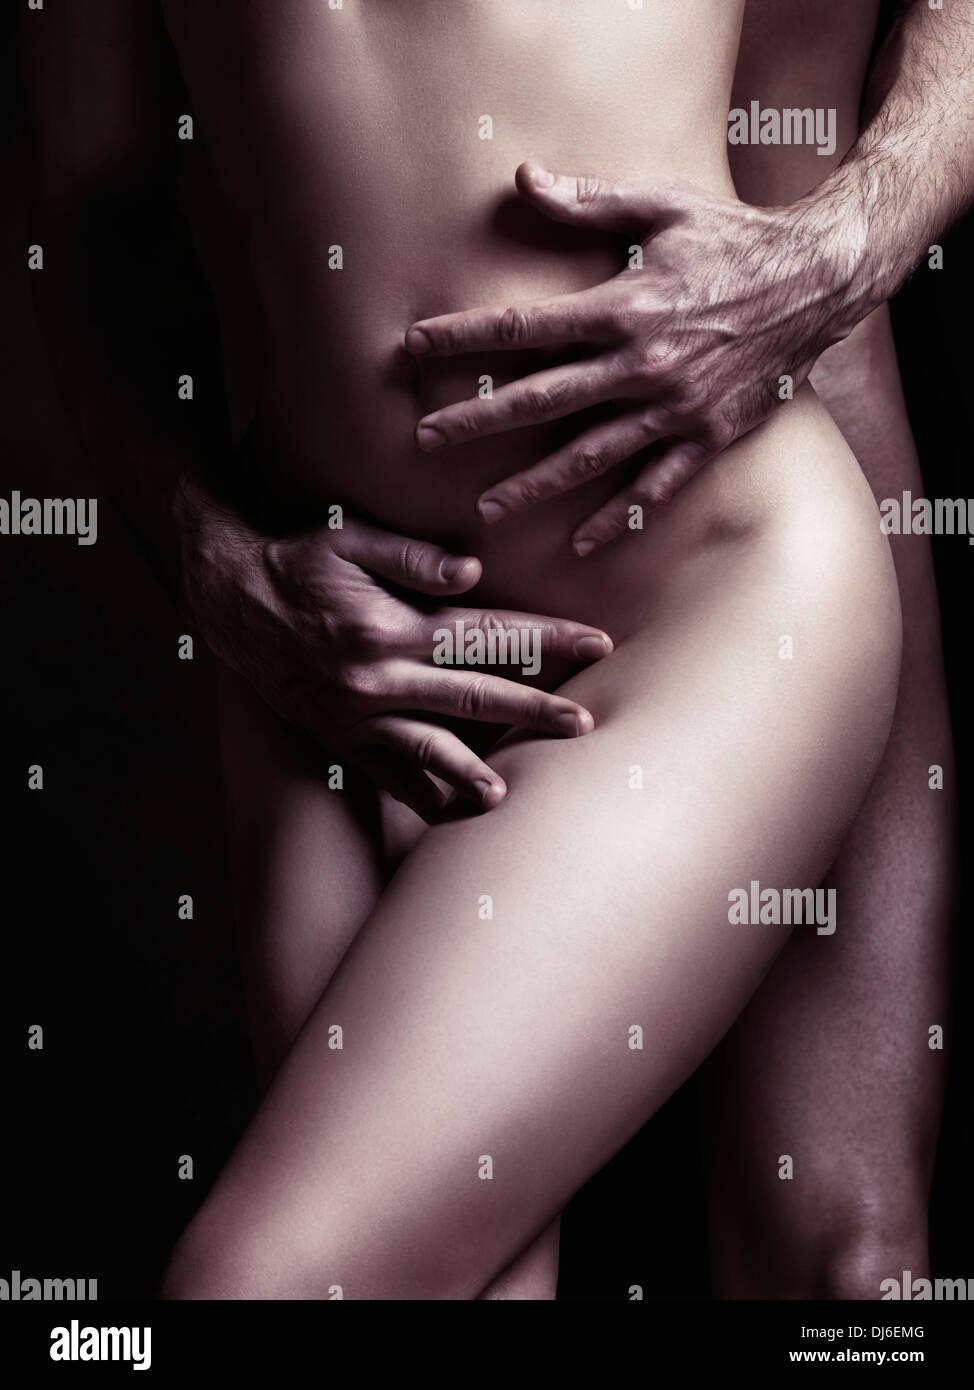 Umarmung Nackt